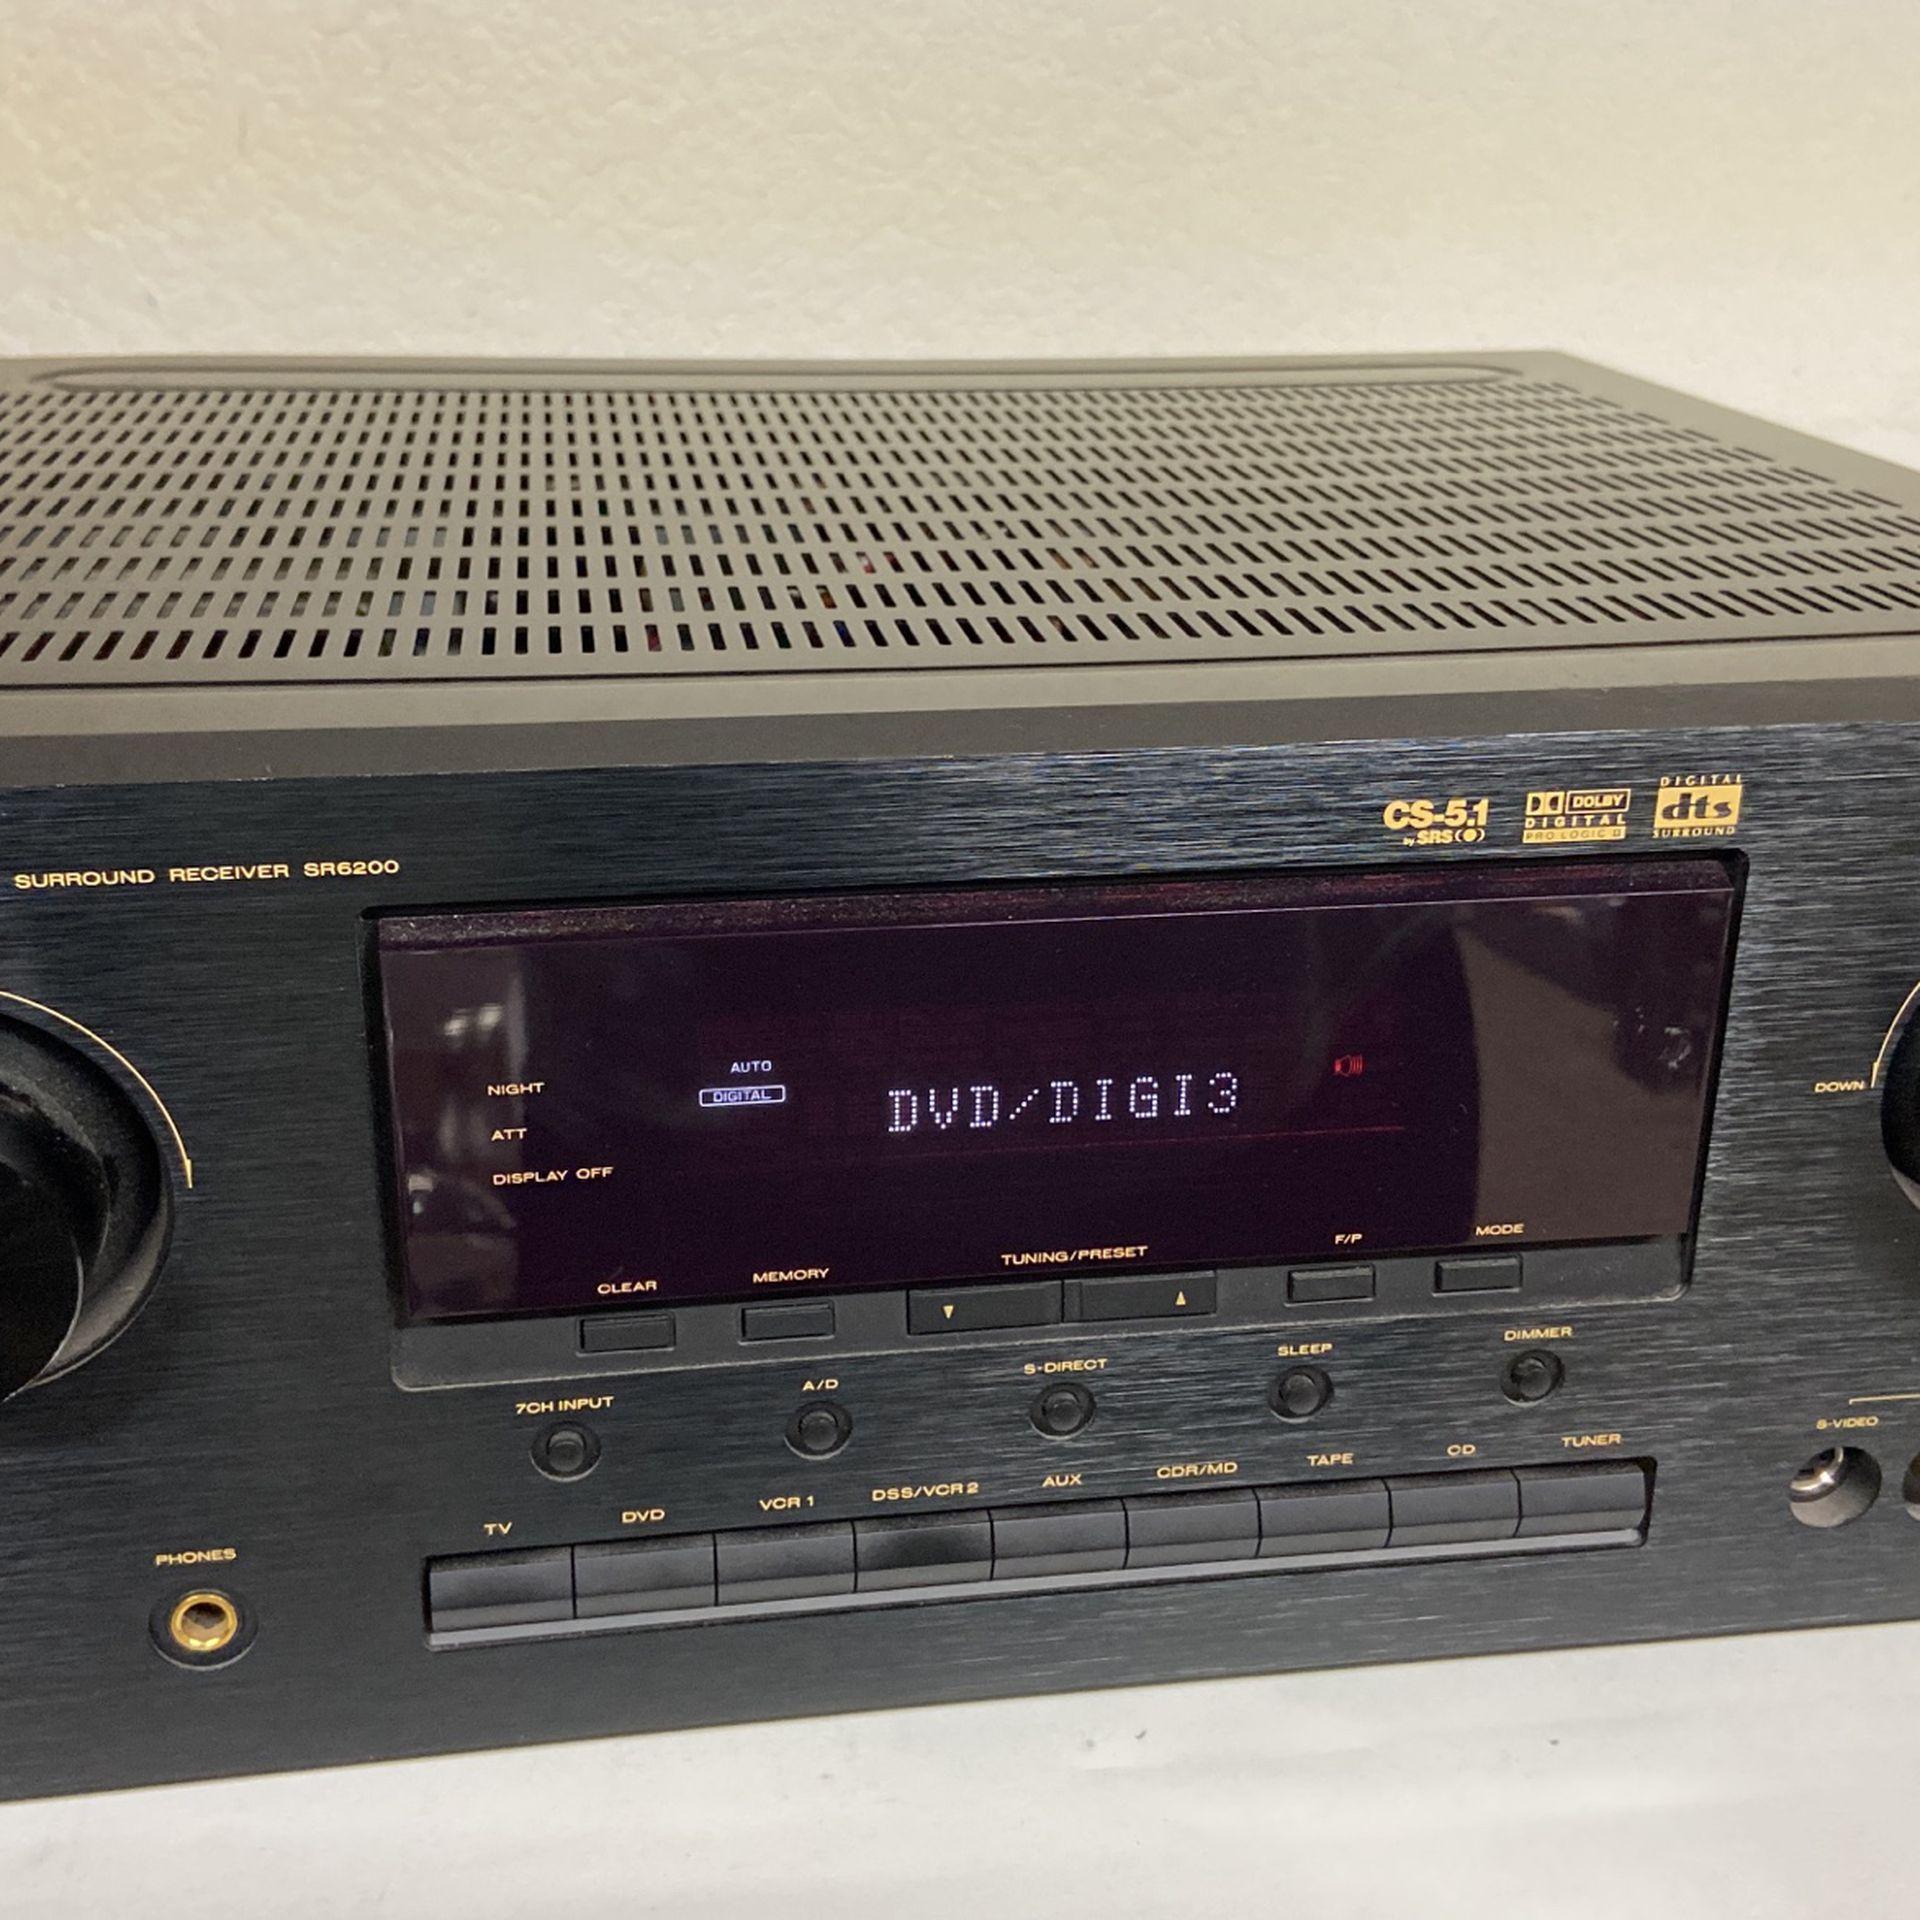 Marantz Amplifier SR6200